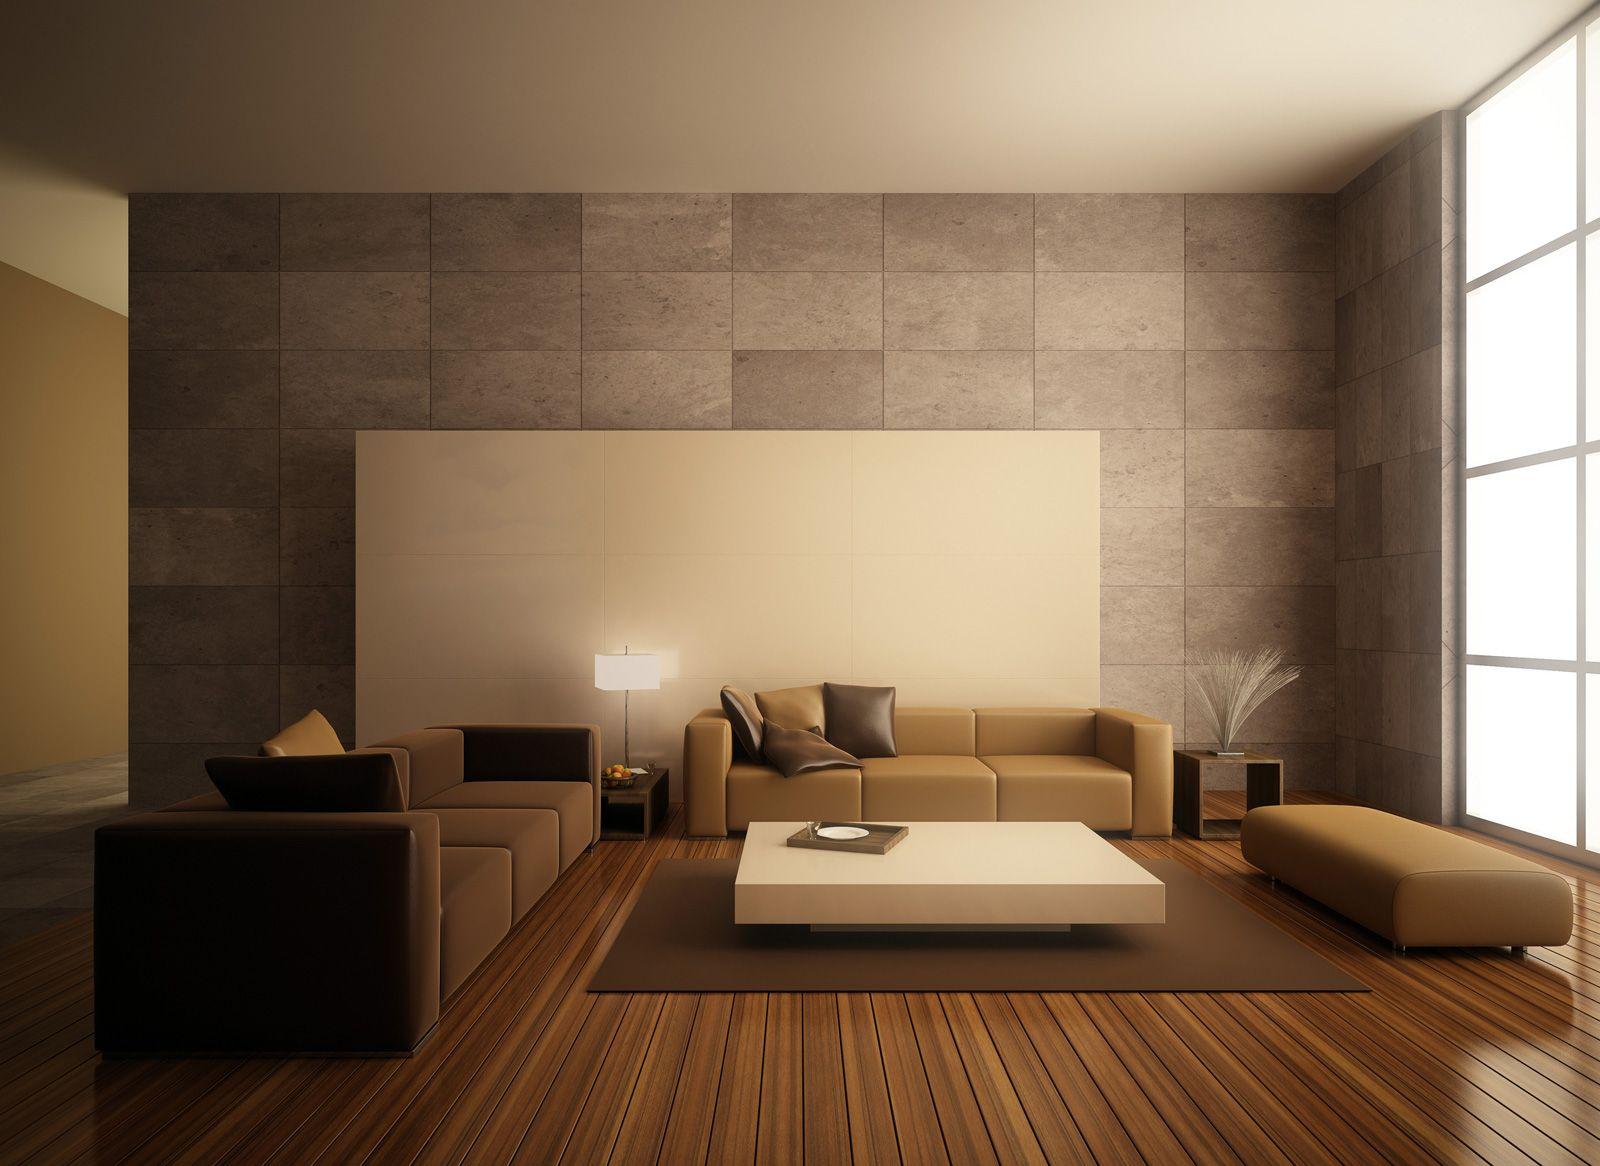 Clean and serene minimalist interior - Minimalist Interior Design is Maximum on Style